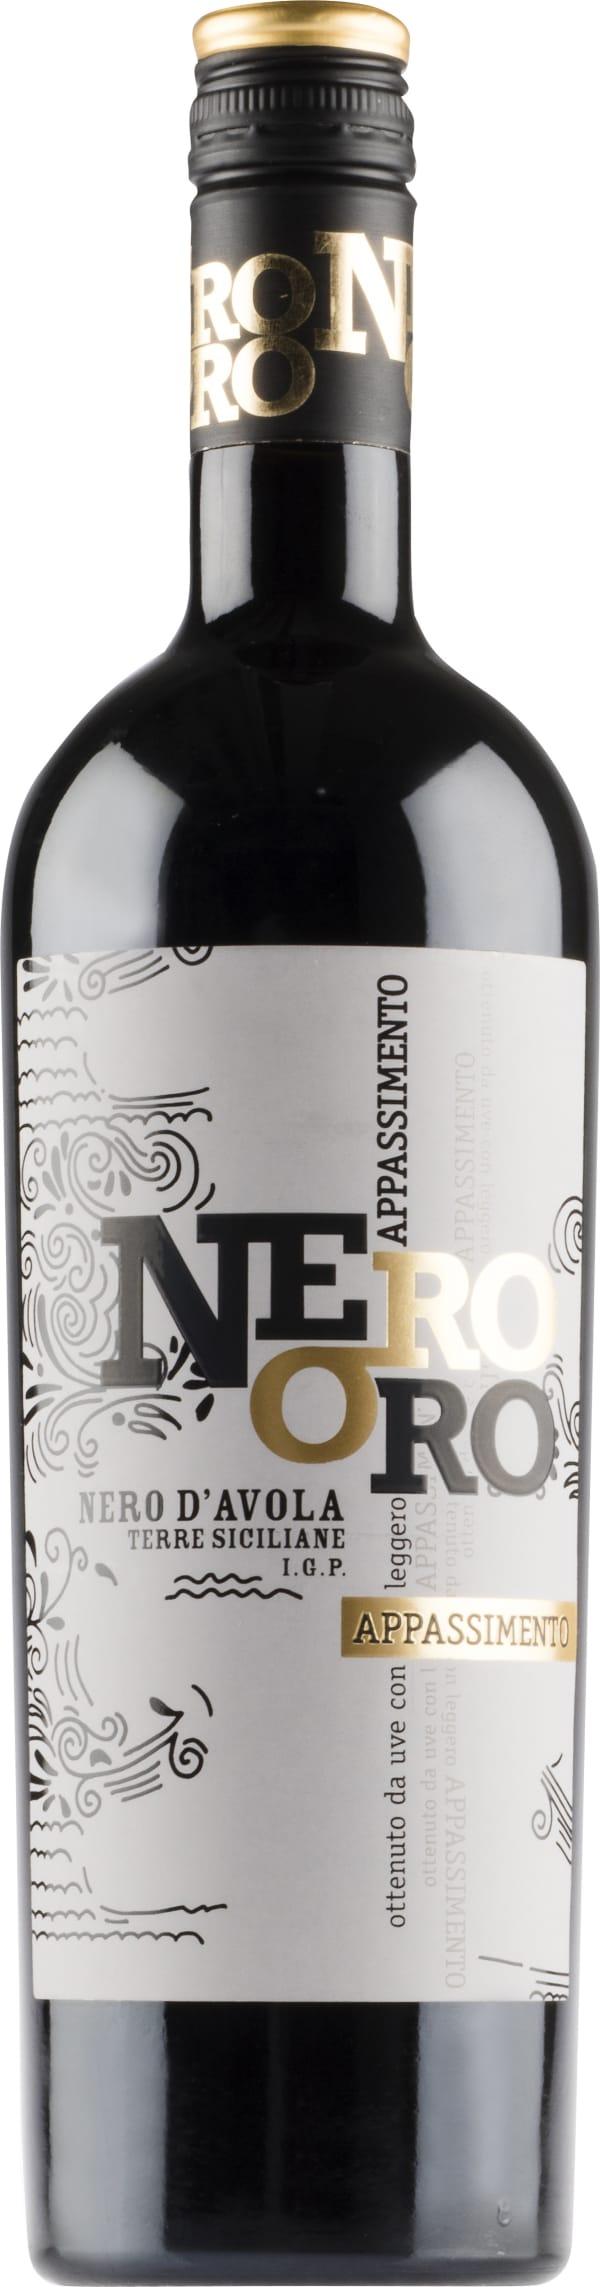 Nero Oro Appasiment Nero d'Avola 2016